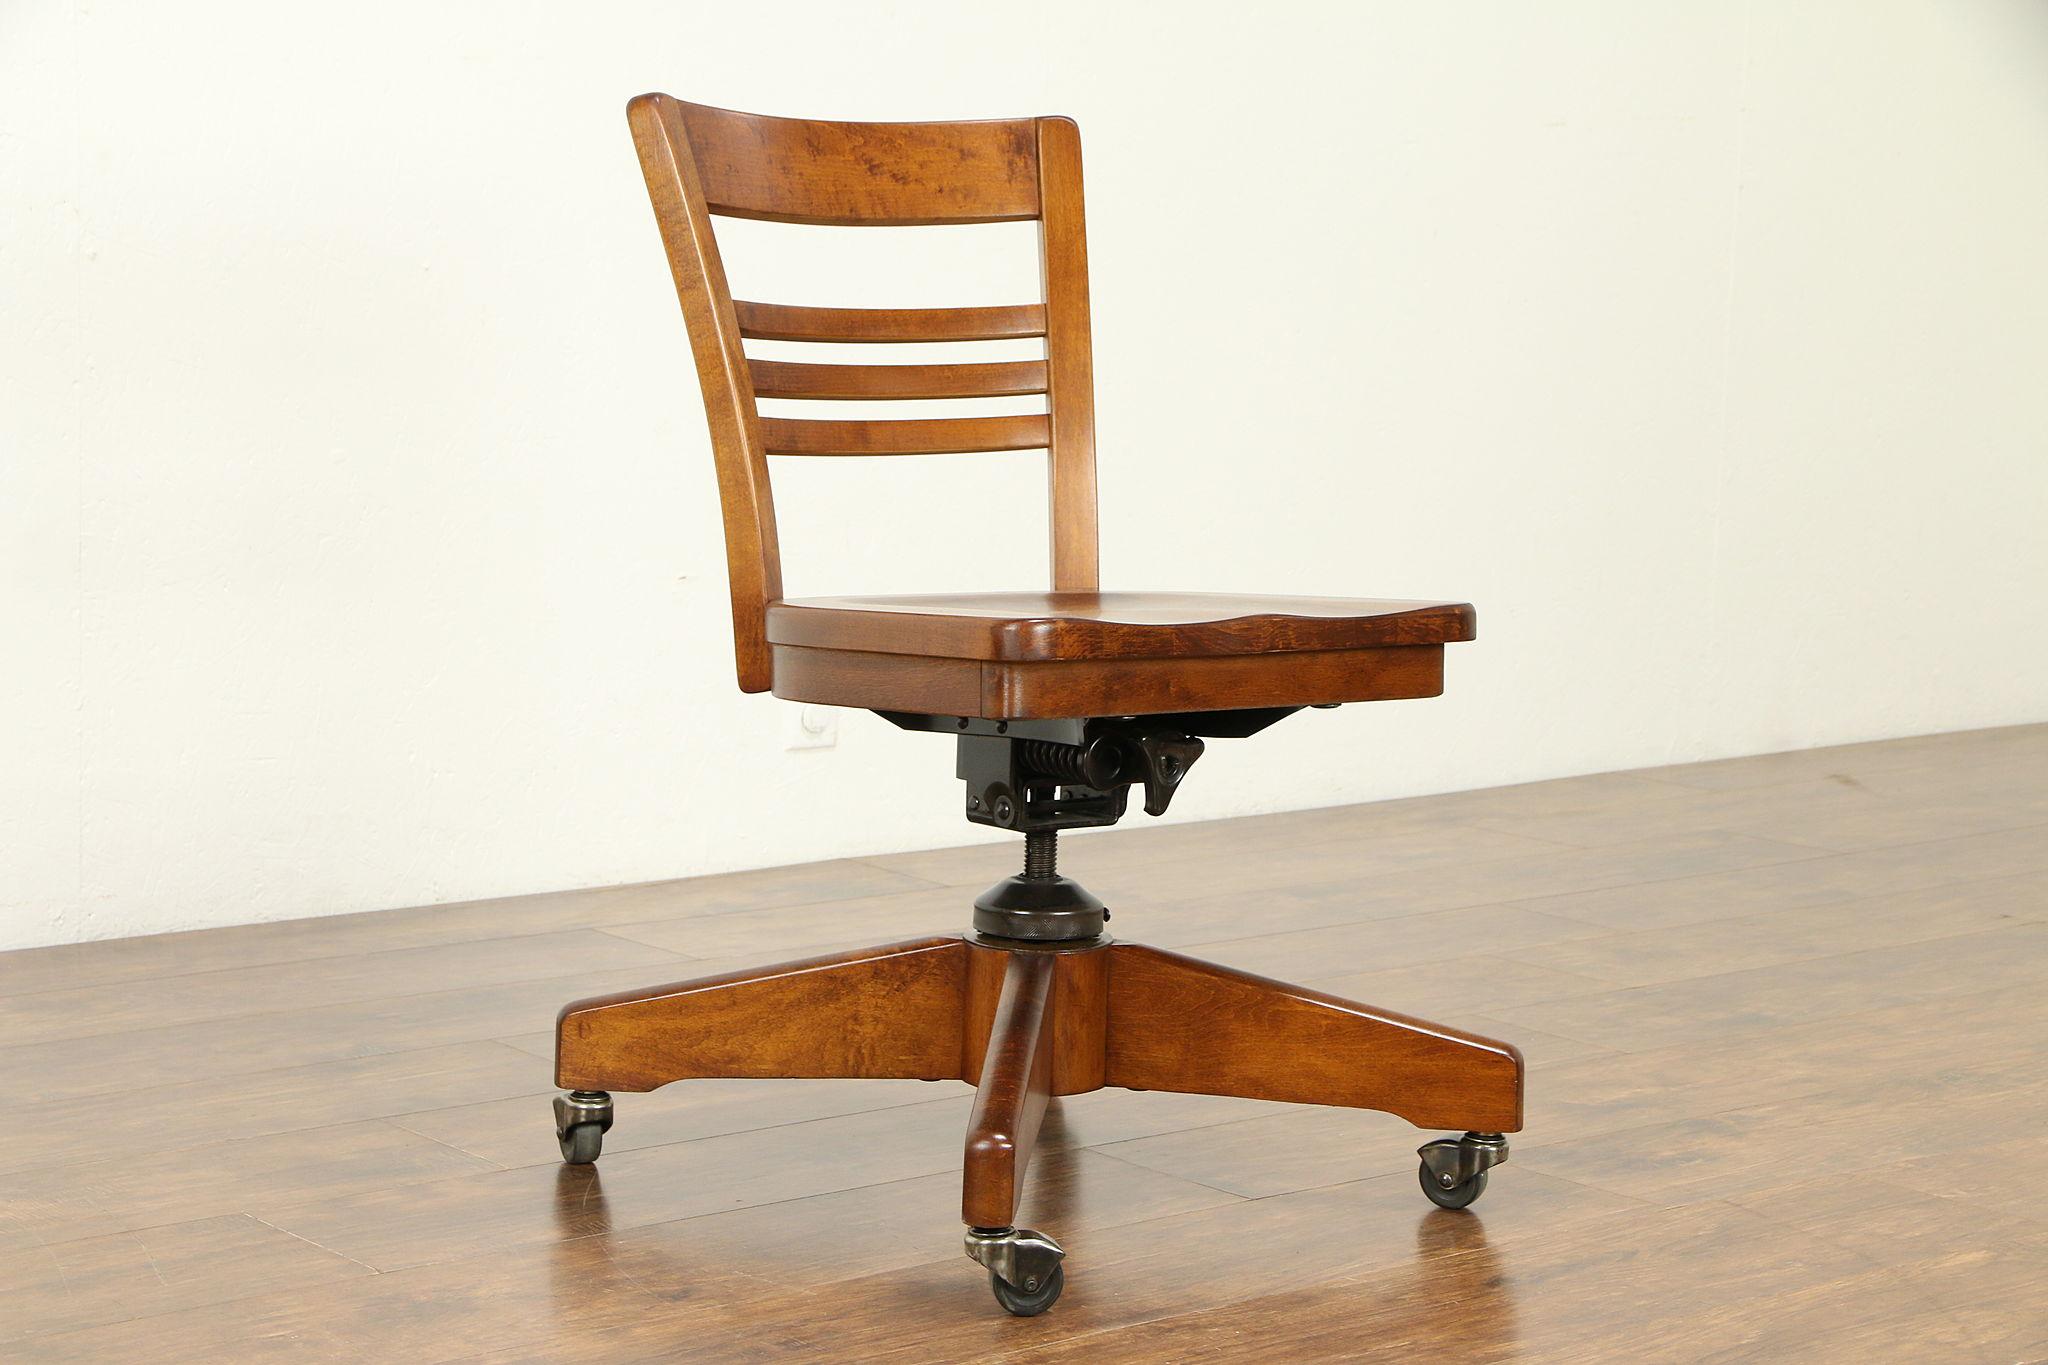 Marvelous Midcentury Modern 1940S Vintage Swivel Adjustable Desk Chair Signed 32199 Unemploymentrelief Wooden Chair Designs For Living Room Unemploymentrelieforg